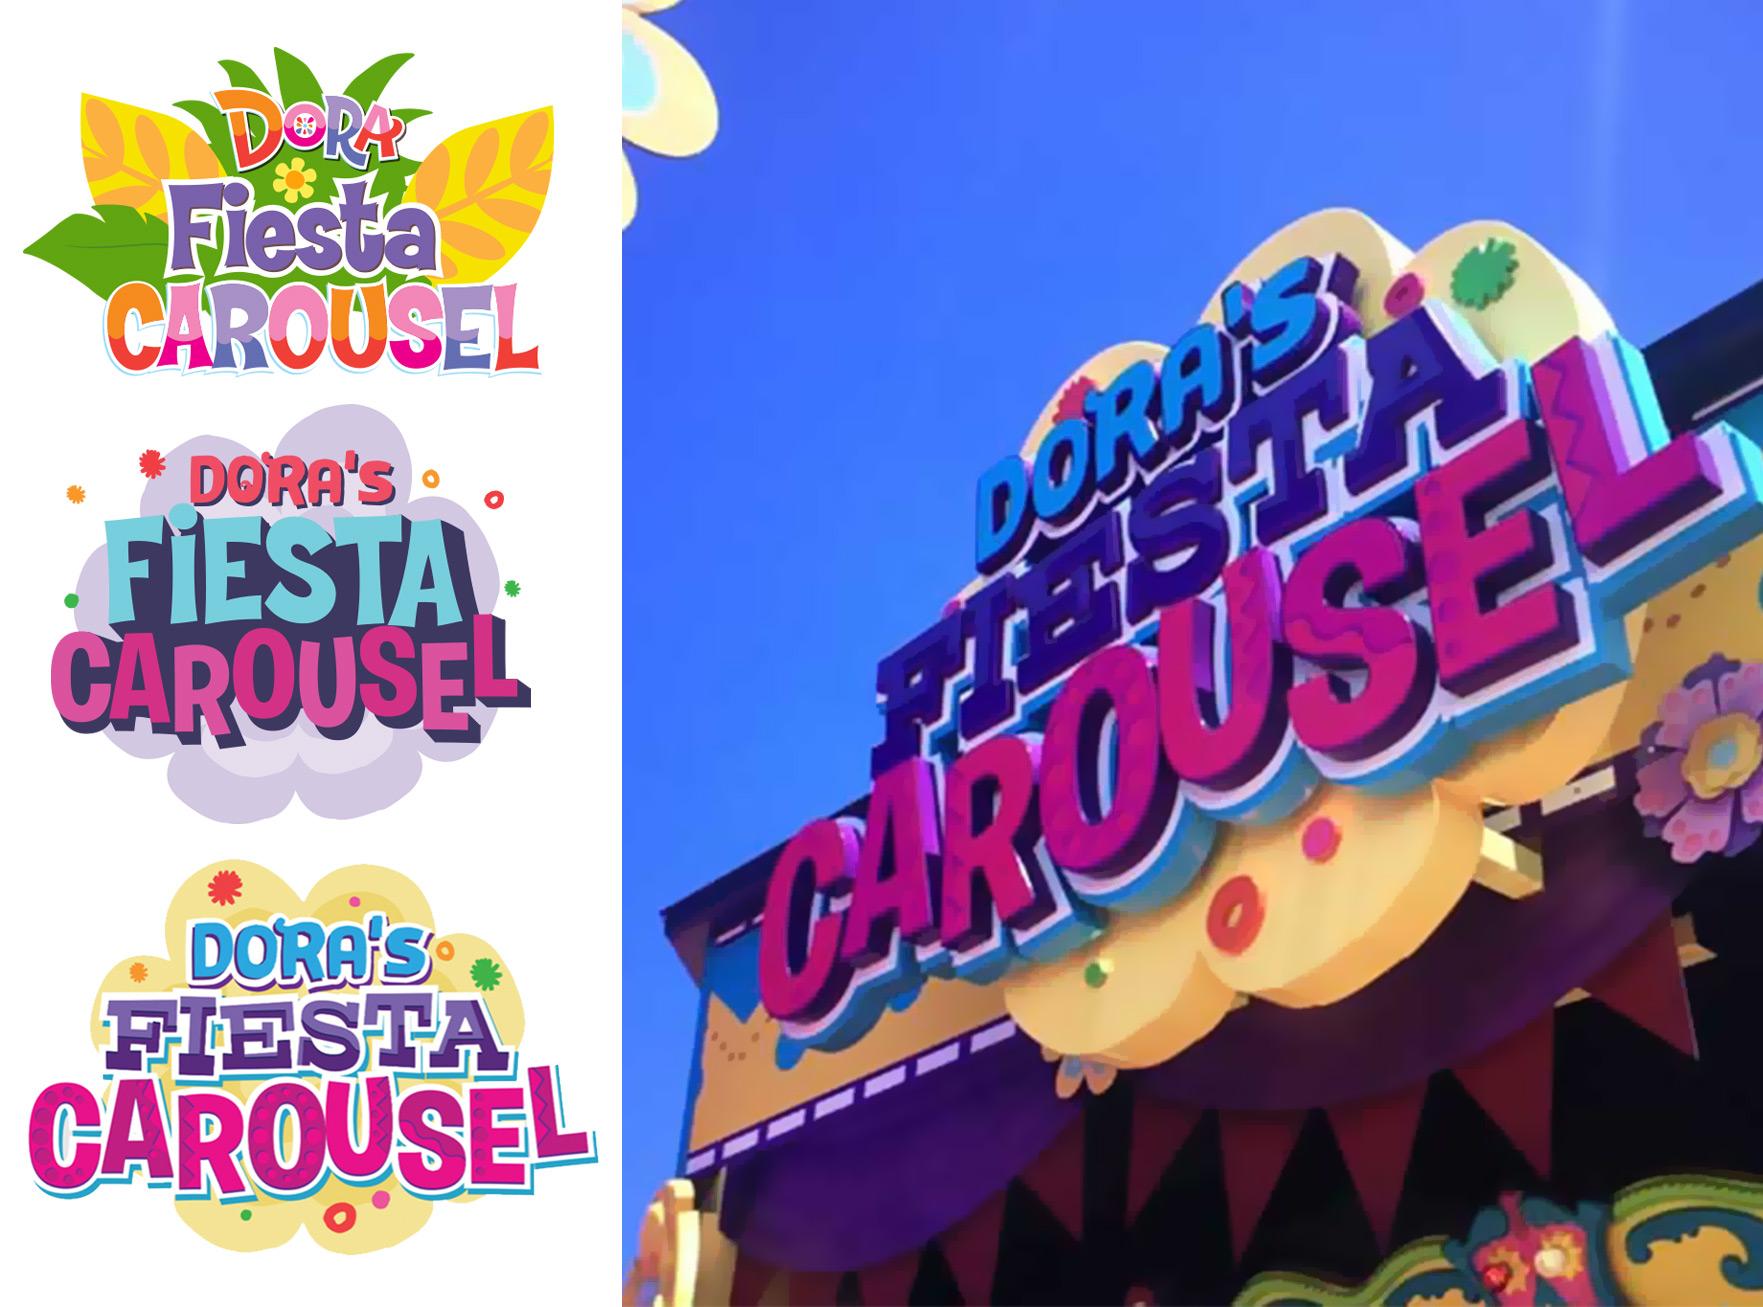 Dora's Fiesta Carousel I.D. sign